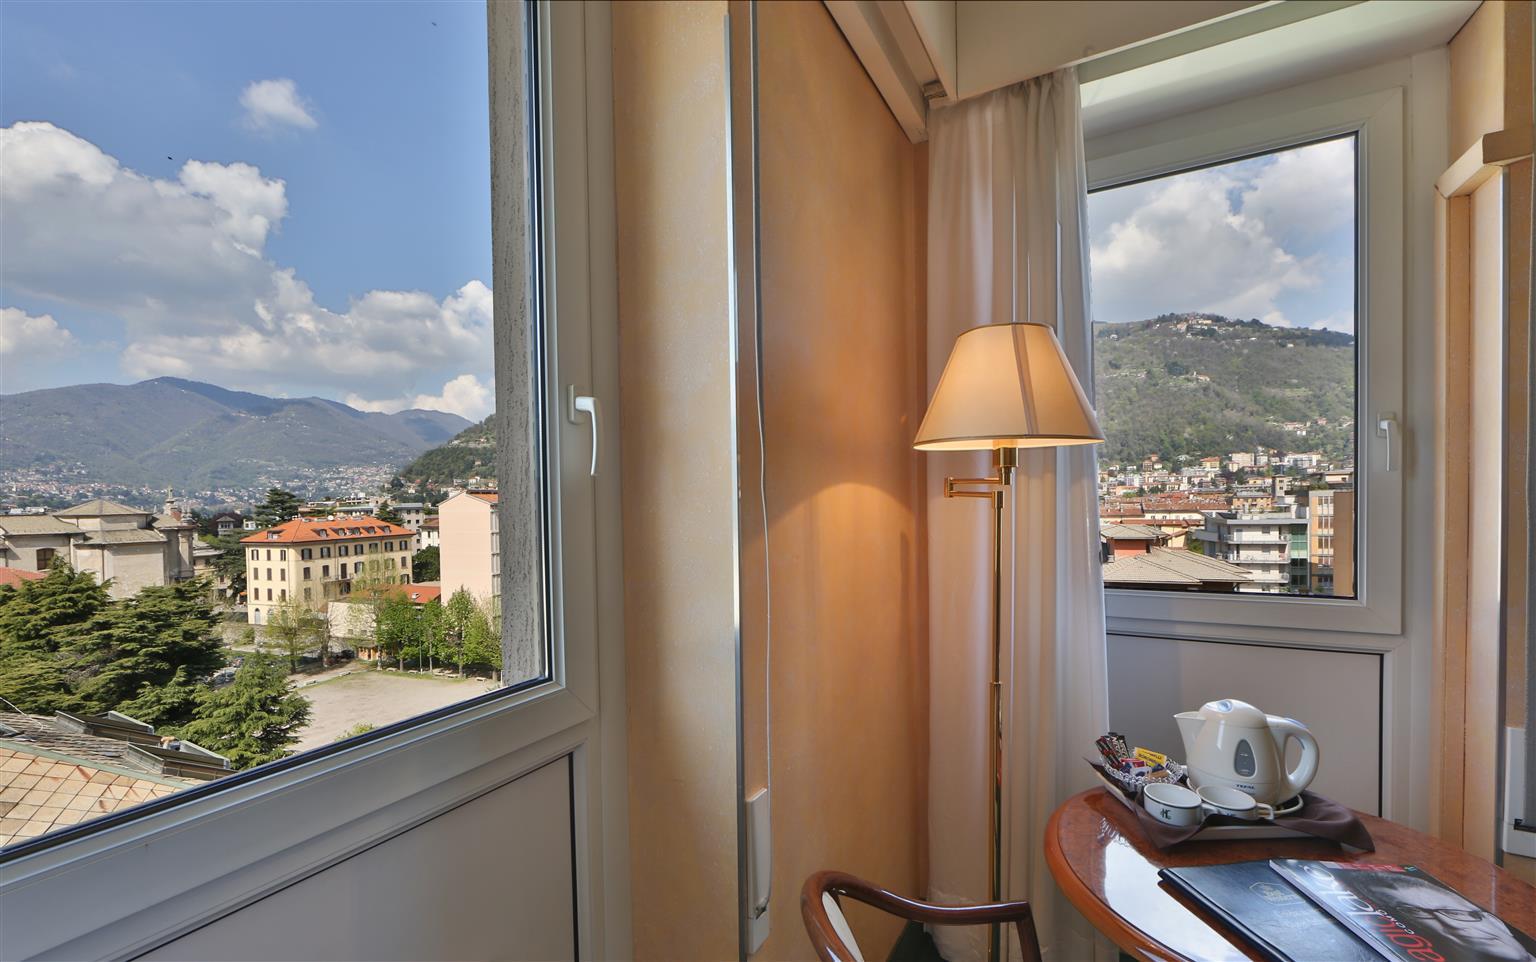 http://extranet.jetlinetravel.info/express-images/express-Best-Western-Hotel-Continental-Lake%20Como%20%281%29.JPEG